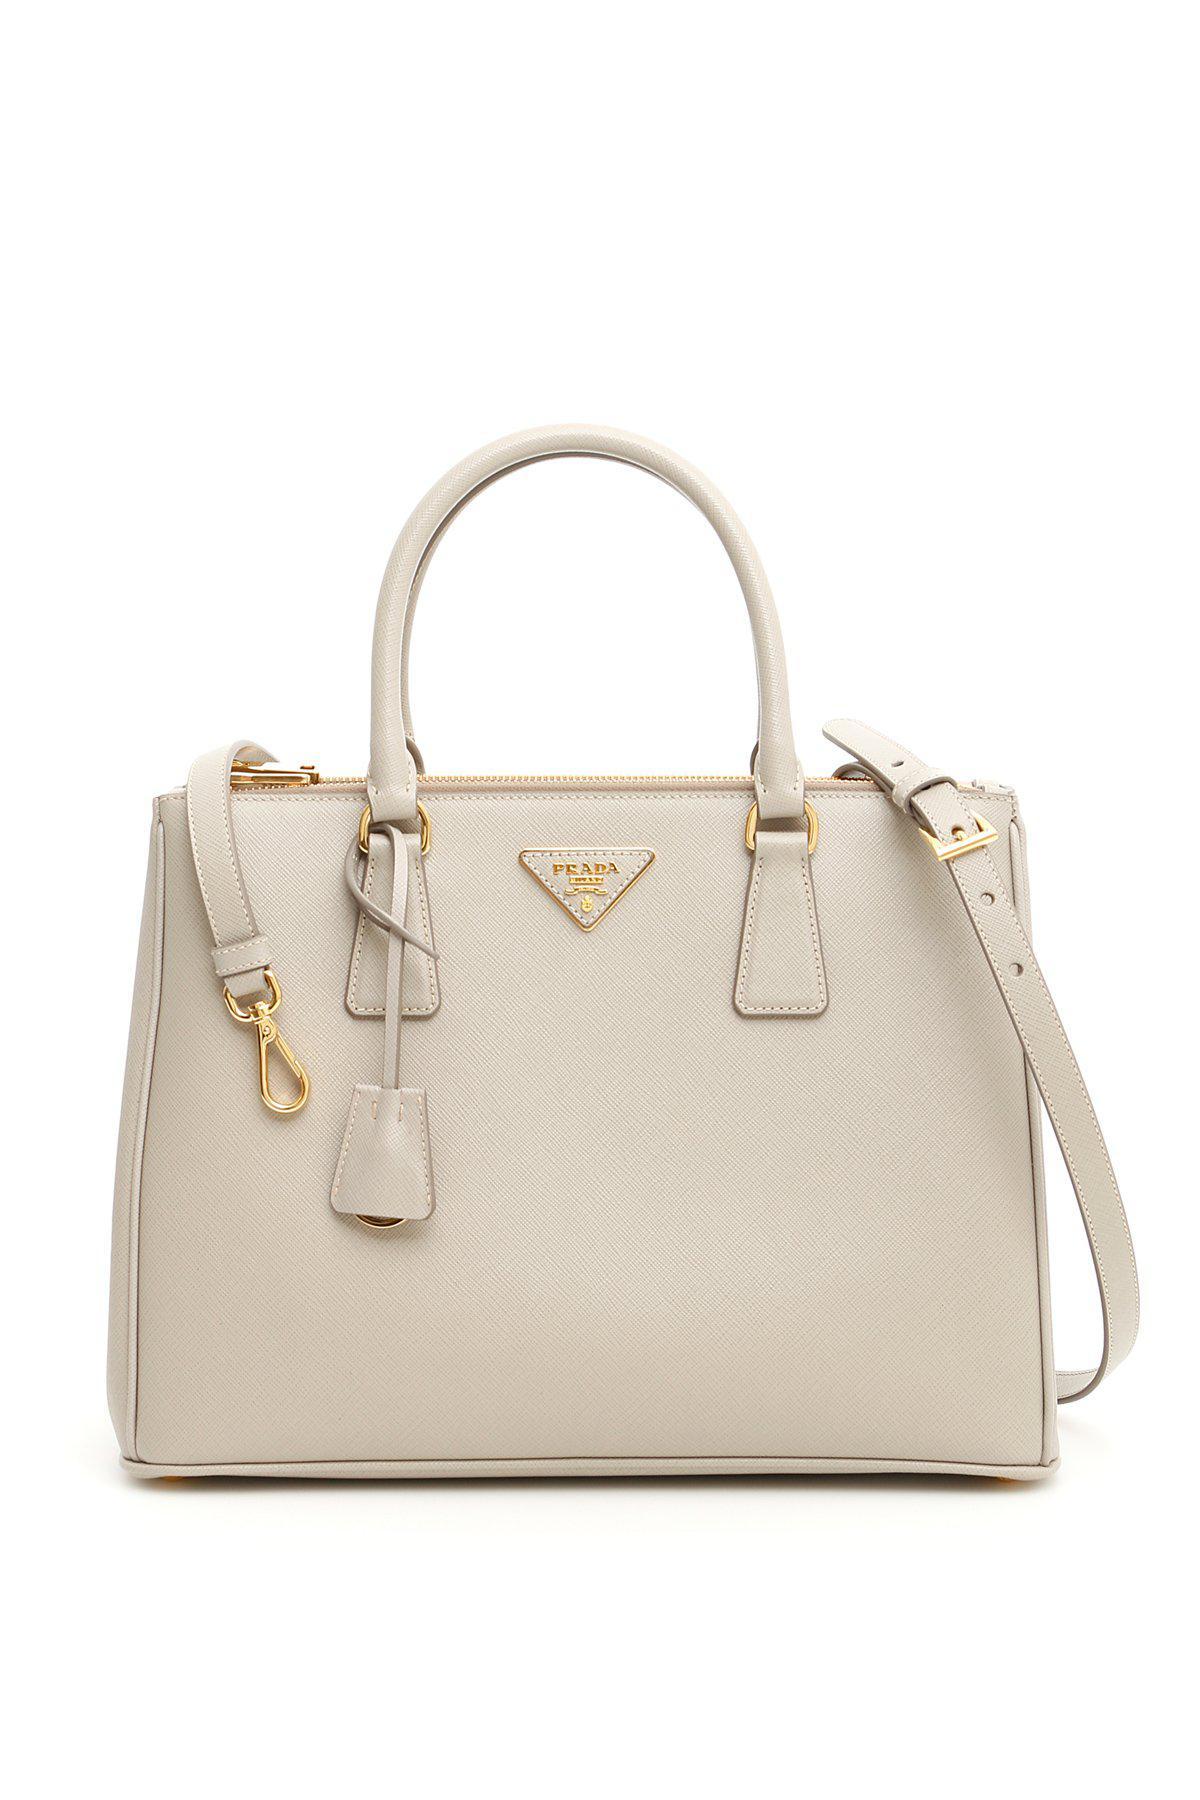 e4abd916d1bd Lyst - Prada Saffiano Lux Galleria Bag in Natural